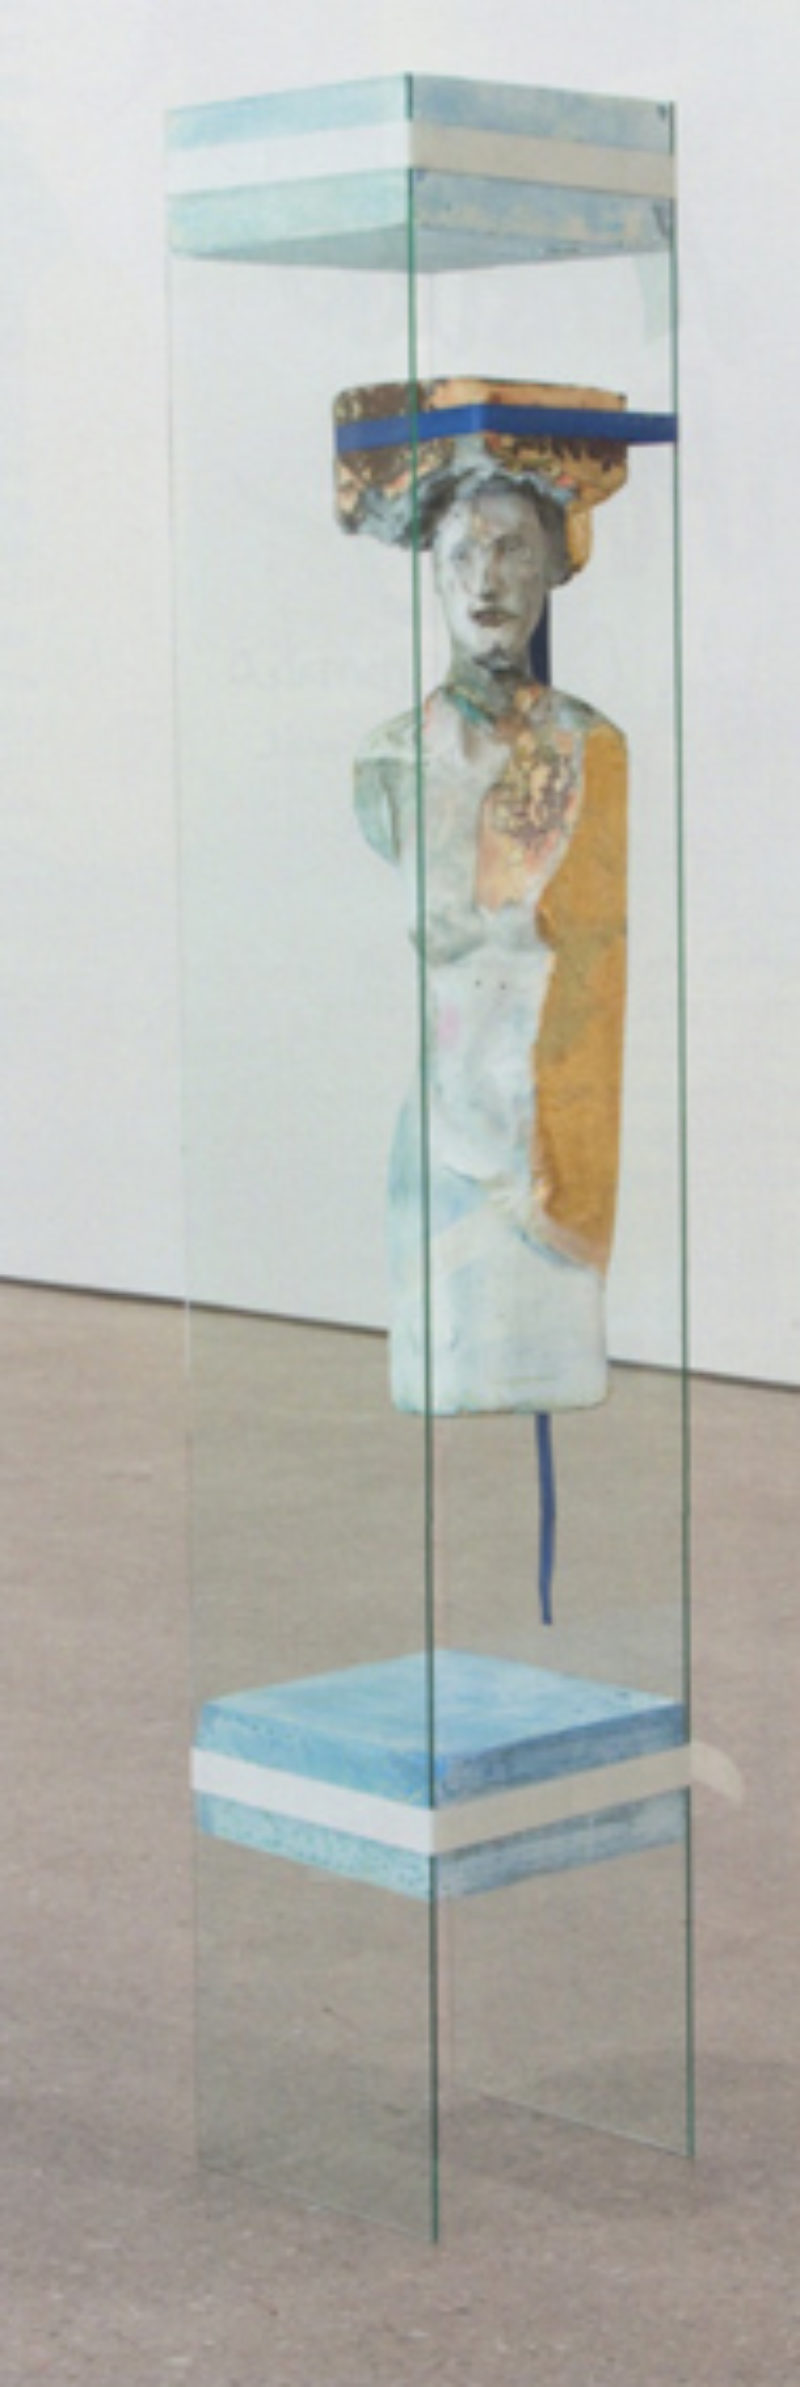 Matthew Monahan, 'Dear Mineral', 2008, glass, foam, wax, pigment, 3 straps, 3 ratchets